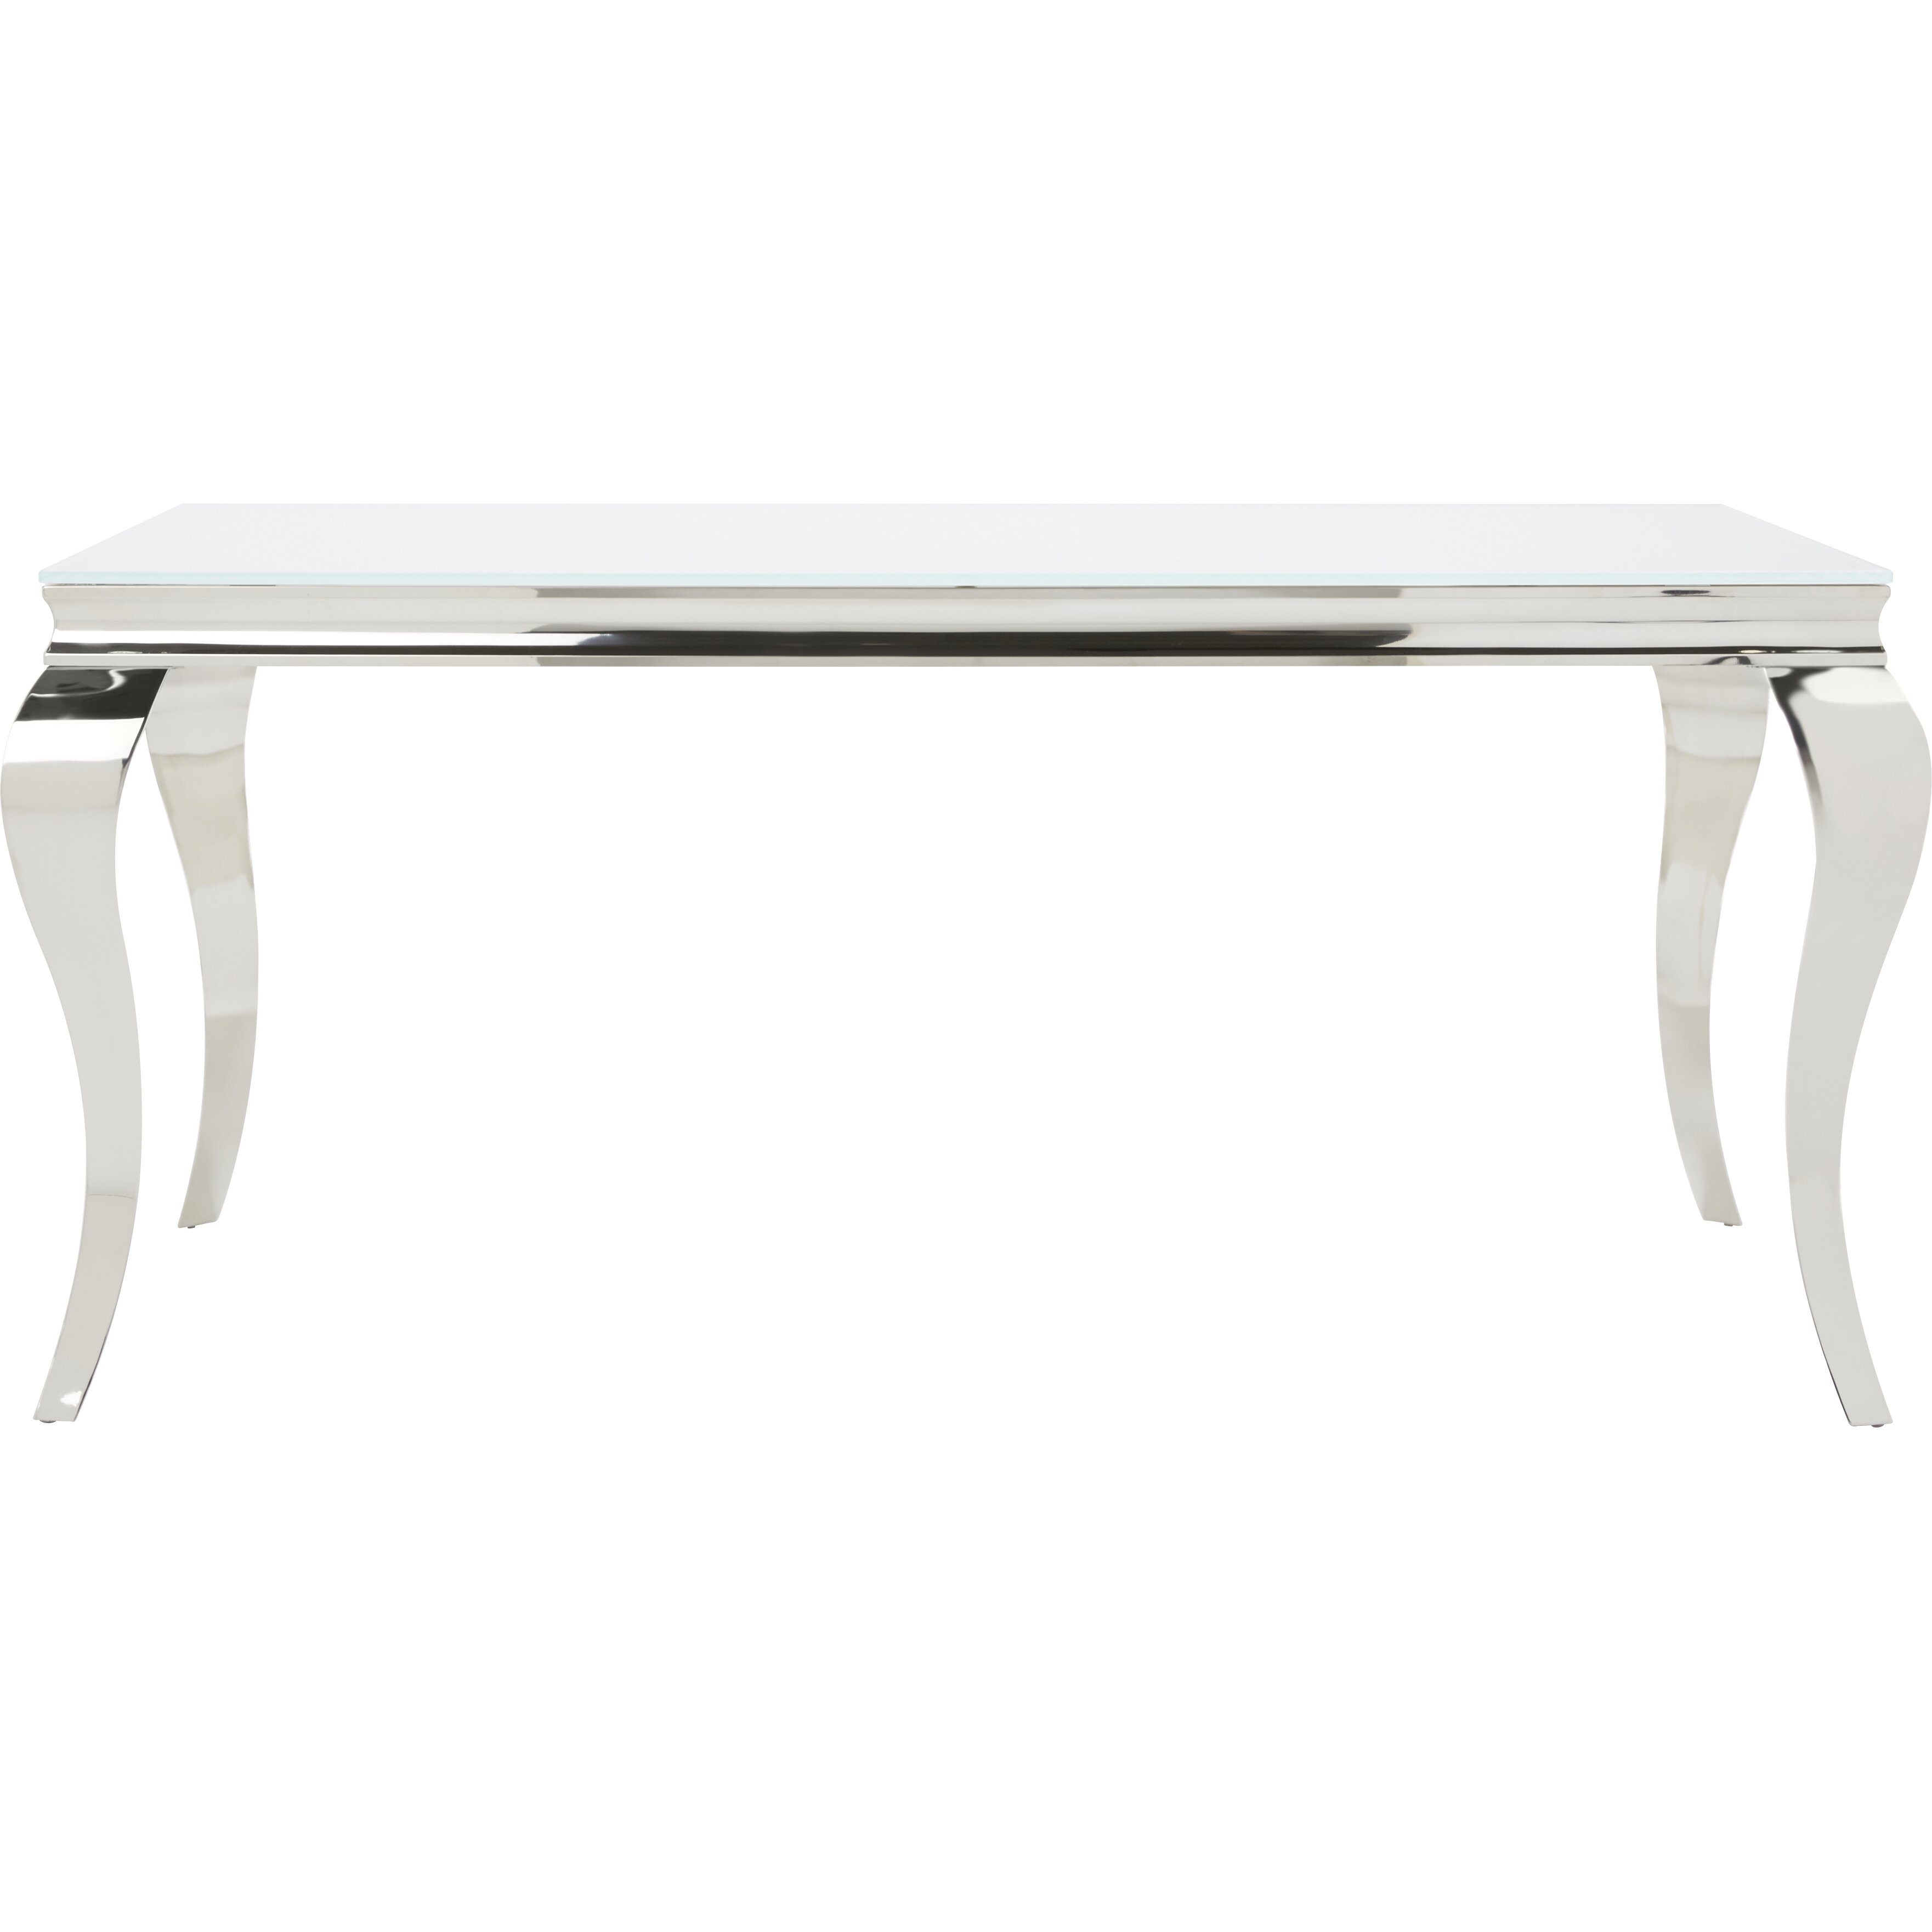 schuller baroque dining table reviews wayfair uk